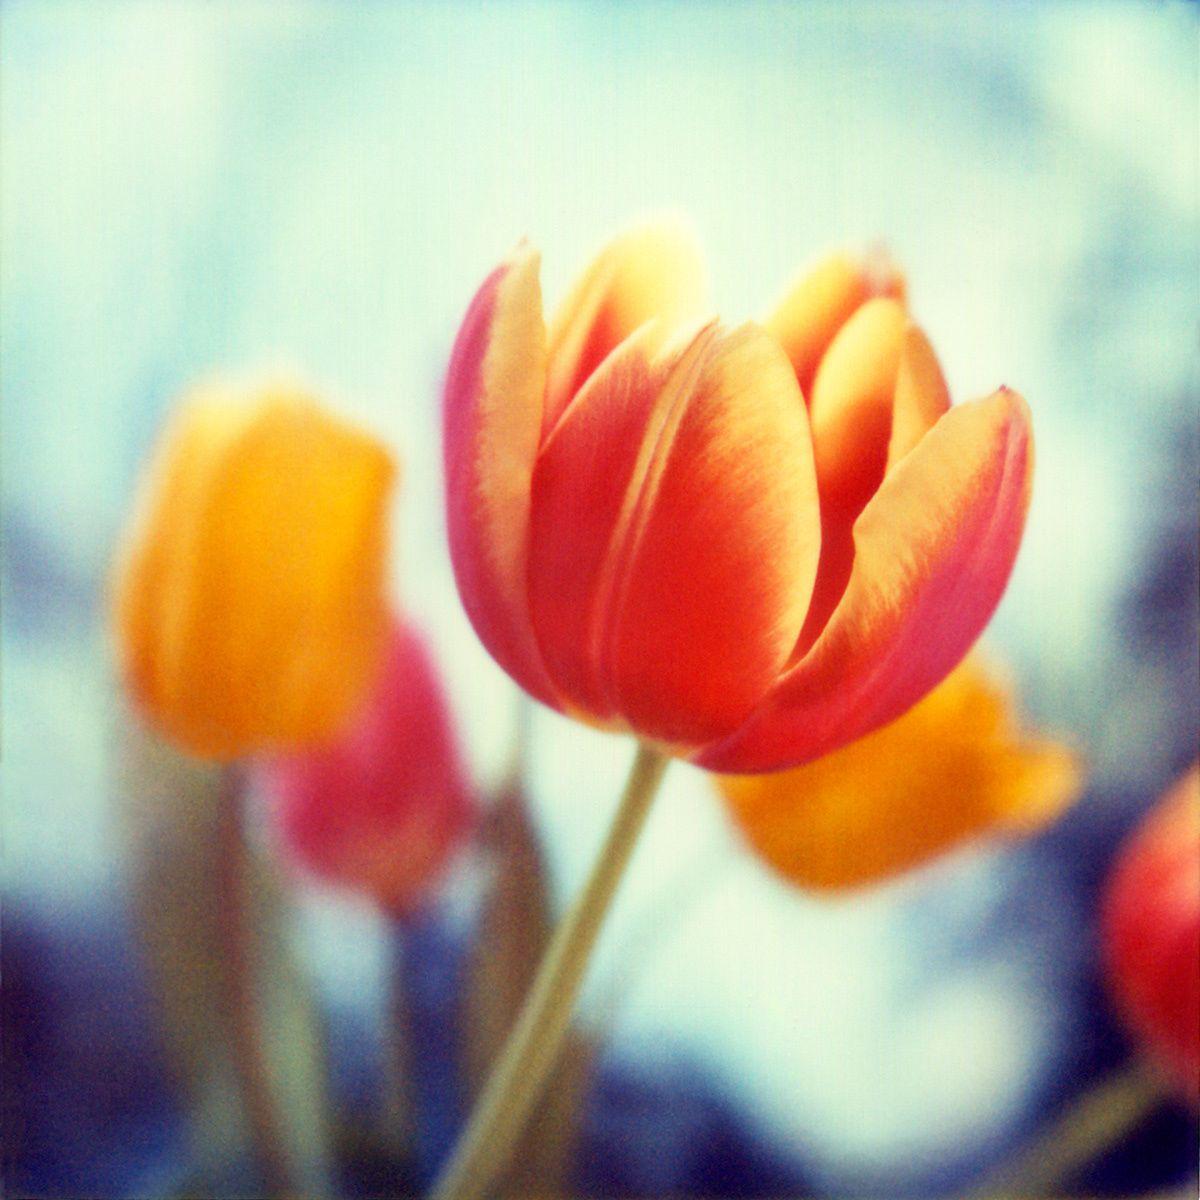 1new_tulip.jpg